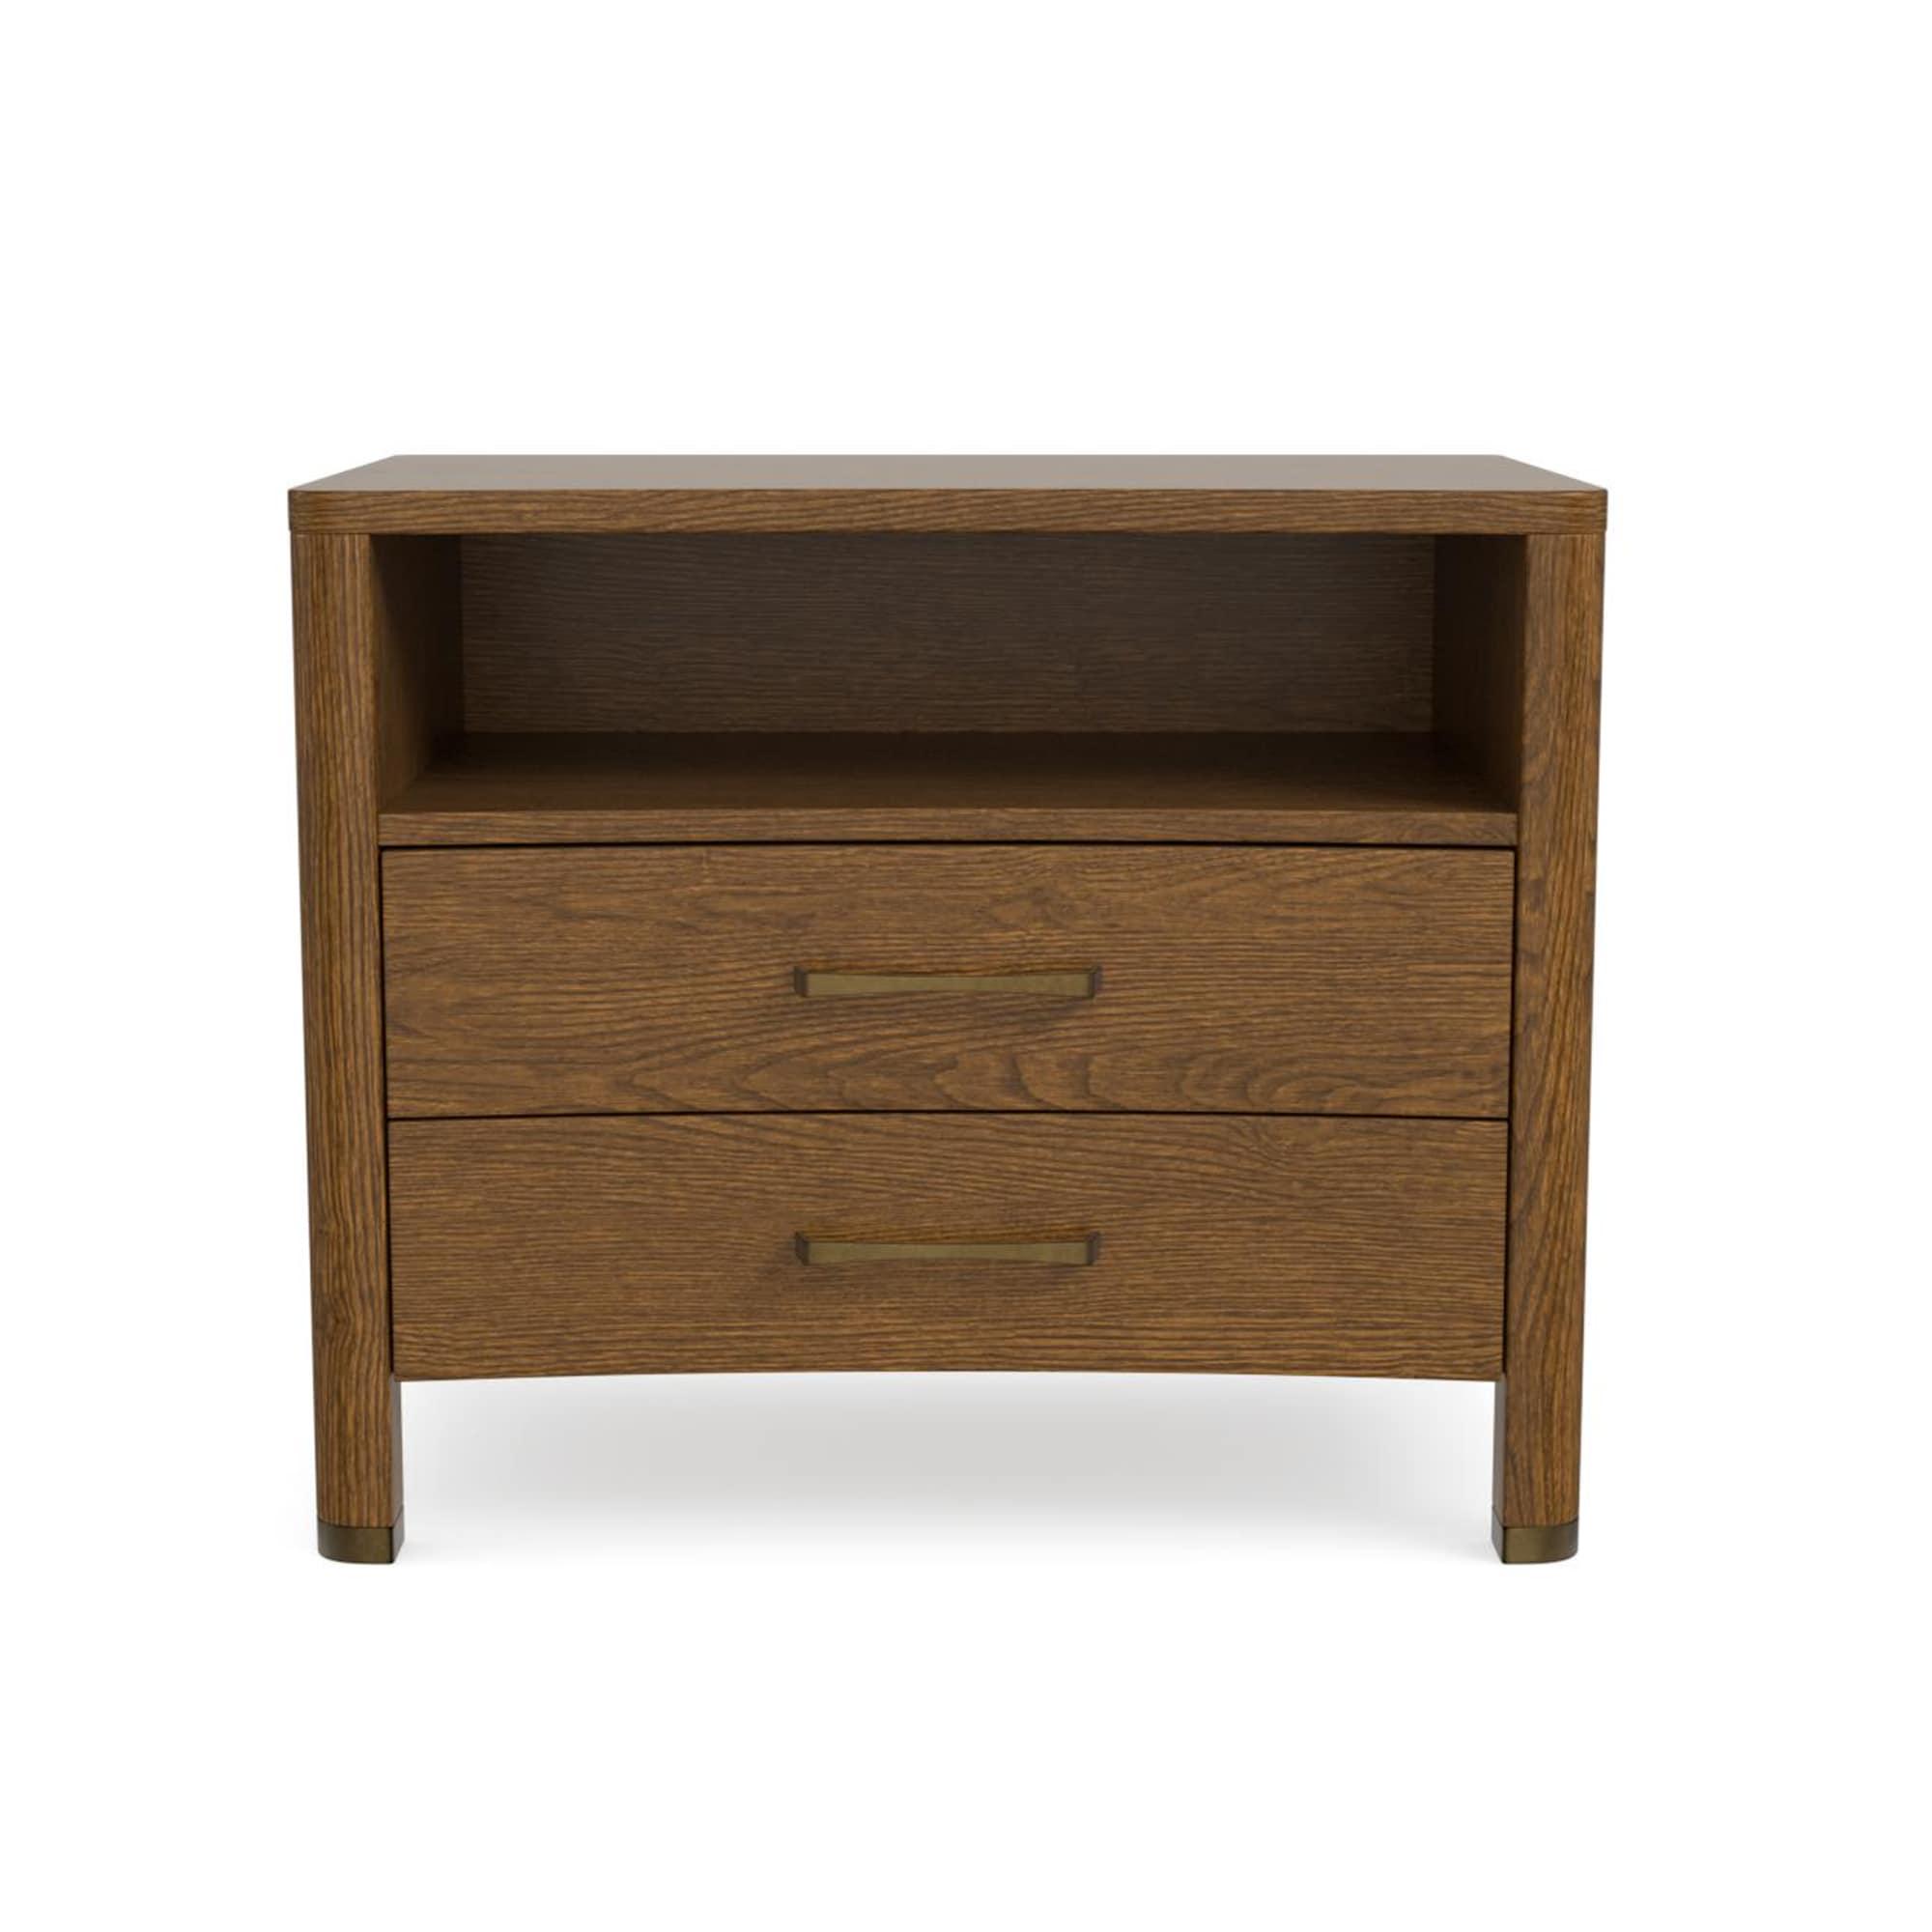 2 Drawer Nightstand With Shelf Caramel Brown Catania